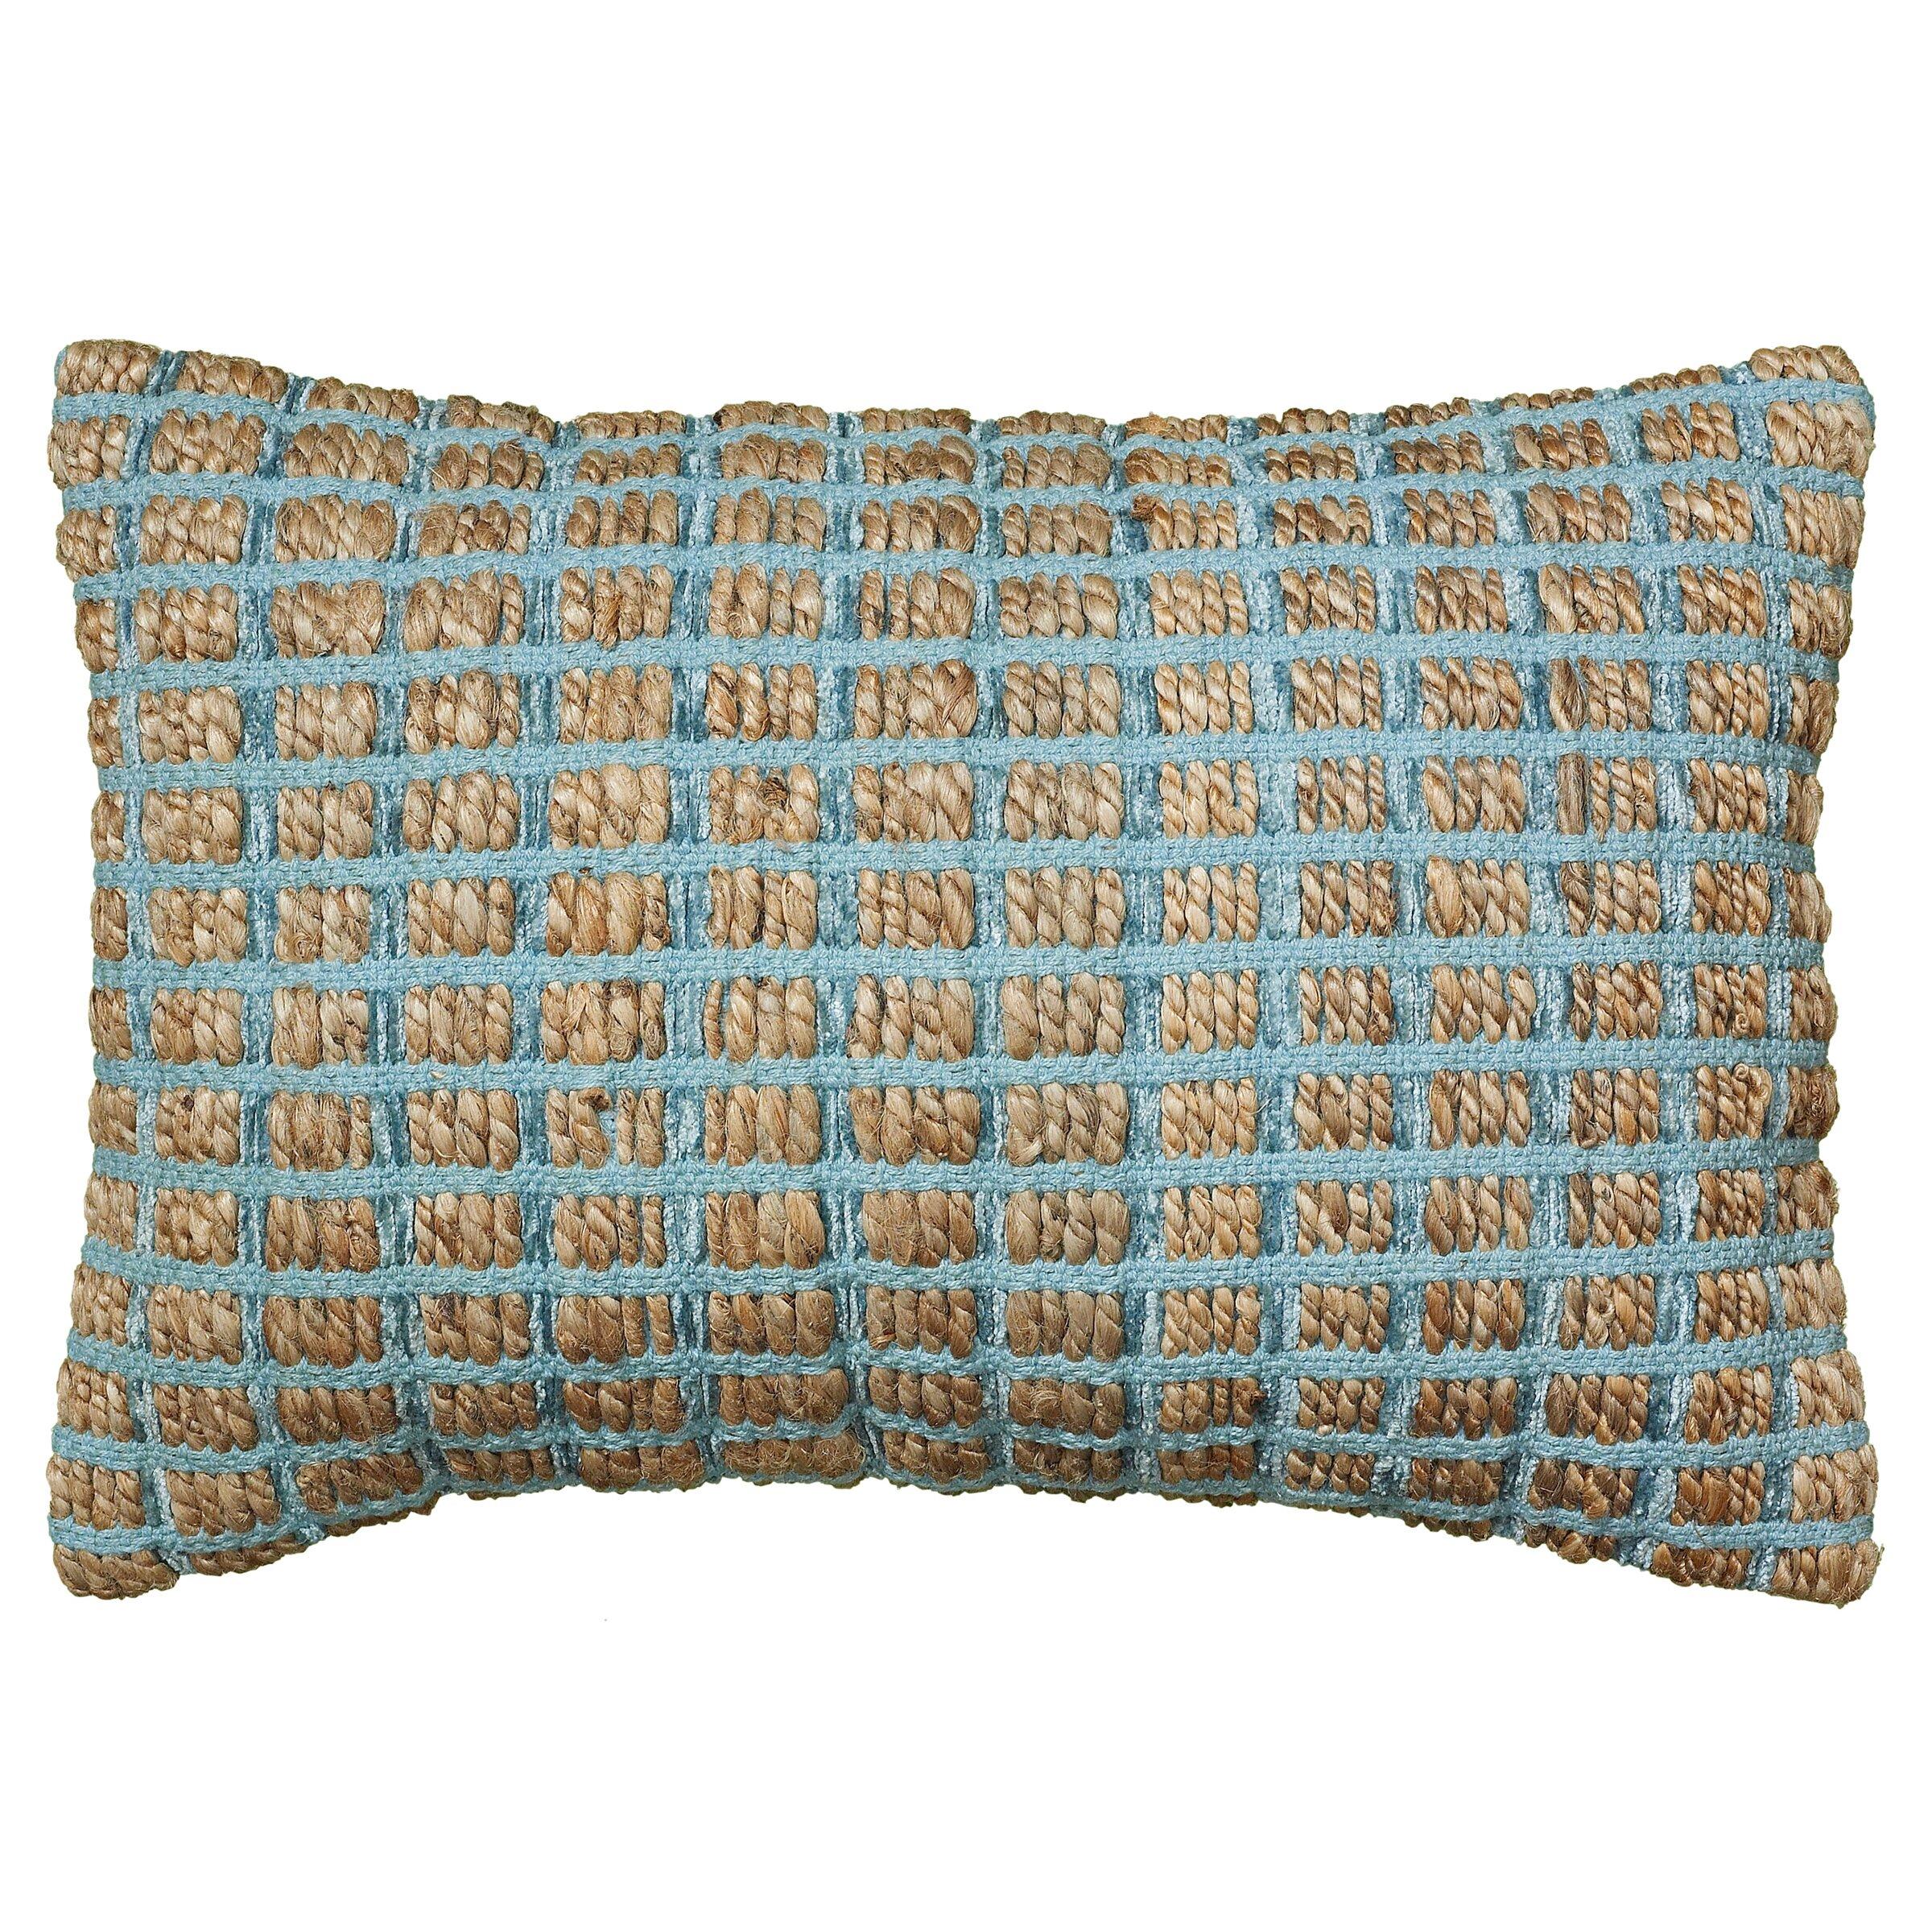 LR Resources Natural Fiber Accent Cotton Throw Pillow & Reviews ... - LR Resources Natural Fiber Accent Cotton Throw Pillow